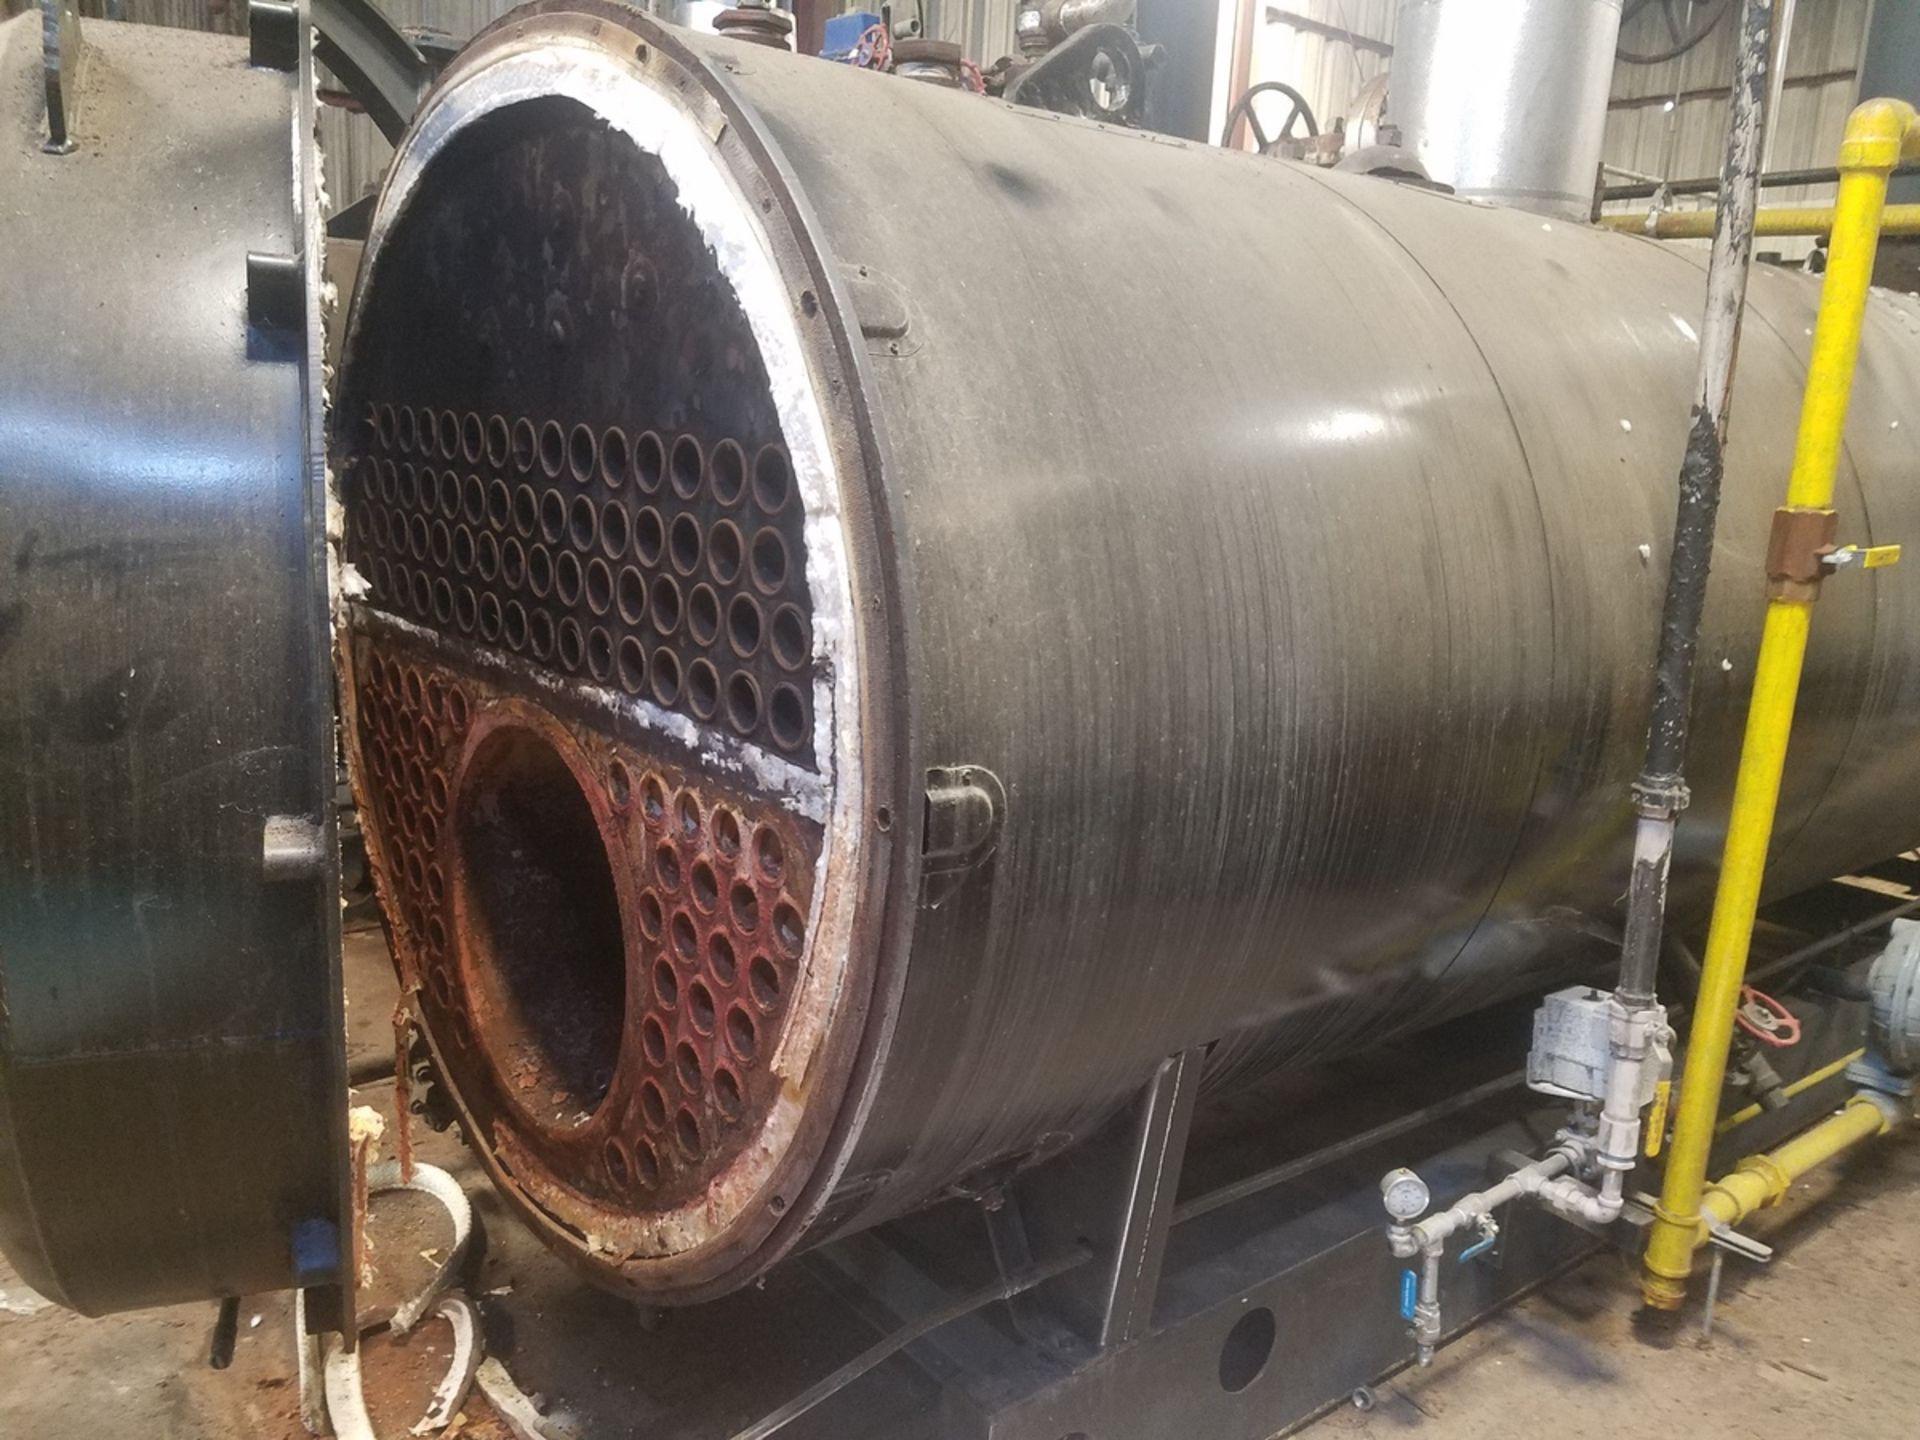 2009 (Rebuilt 2016) 250 HP Cleaver Brooks Boiler, 8.9 mmBTU, M# CB-200-250S-250, | Rig Fee: $5000 - Image 7 of 8